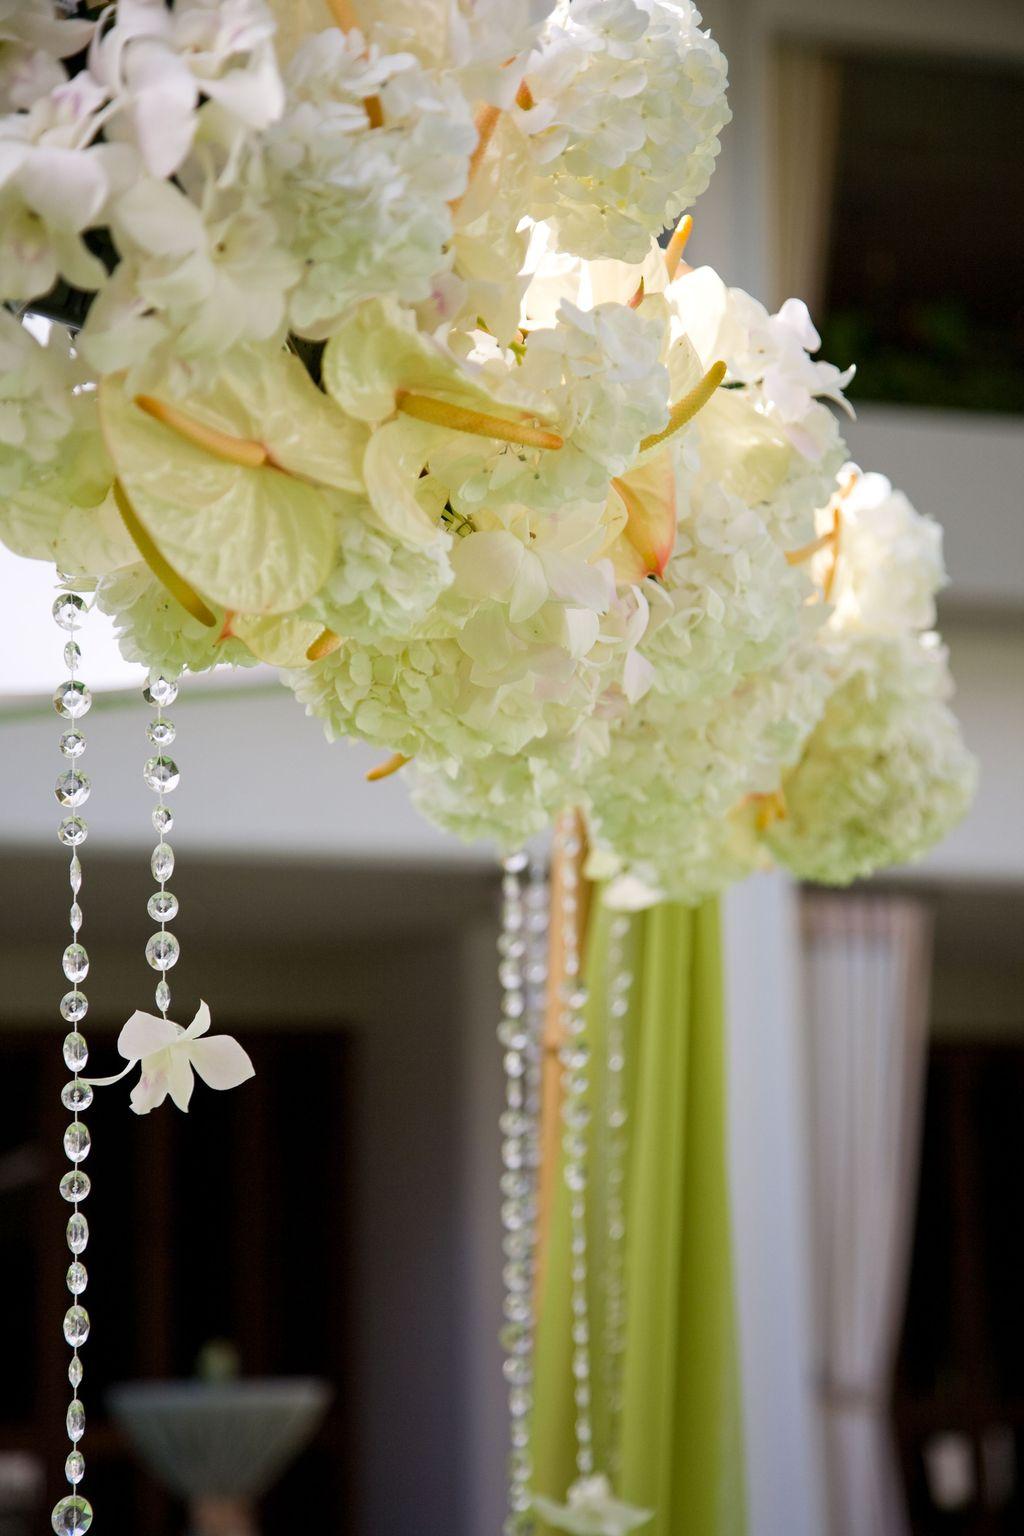 All-white-wedding-flowers-10-blooms-we-love-ceremony-arrangement.full